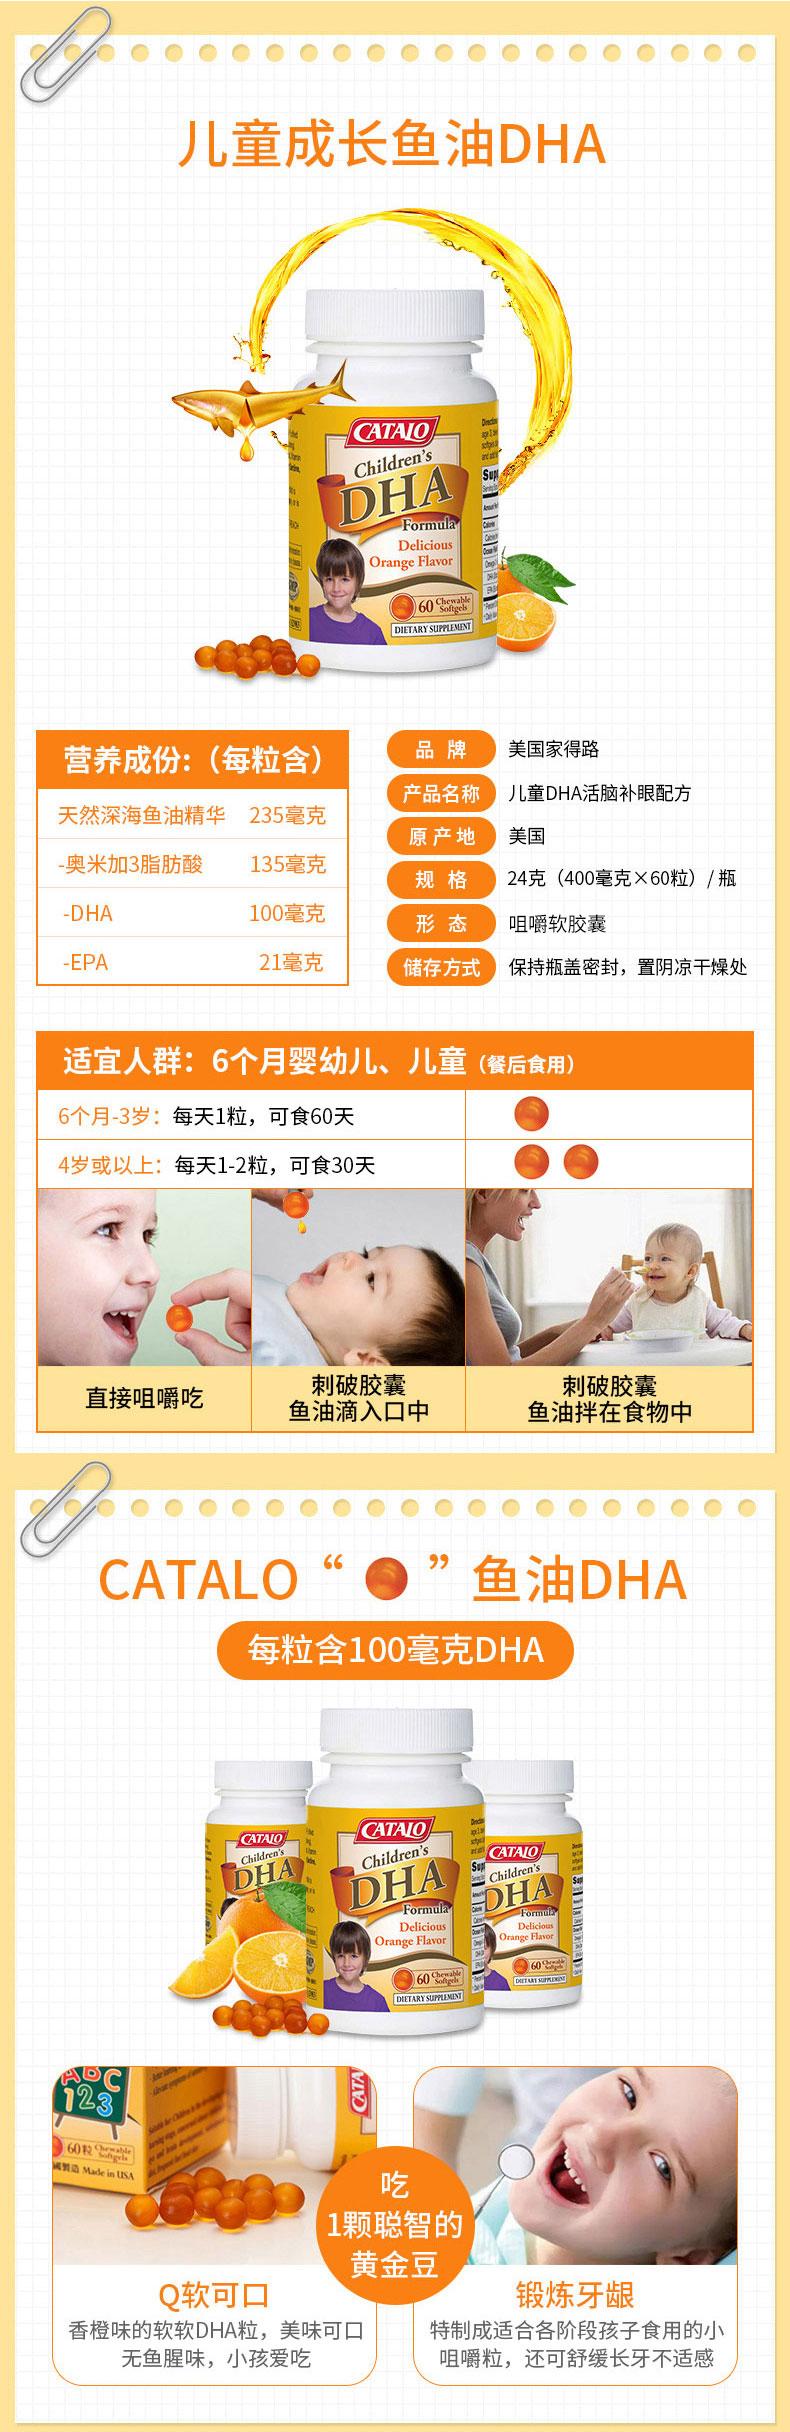 CATALO美国家得路 儿童鱼油dha活脑补眼+儿童全效护眼专家 套餐 产品系列 第5张